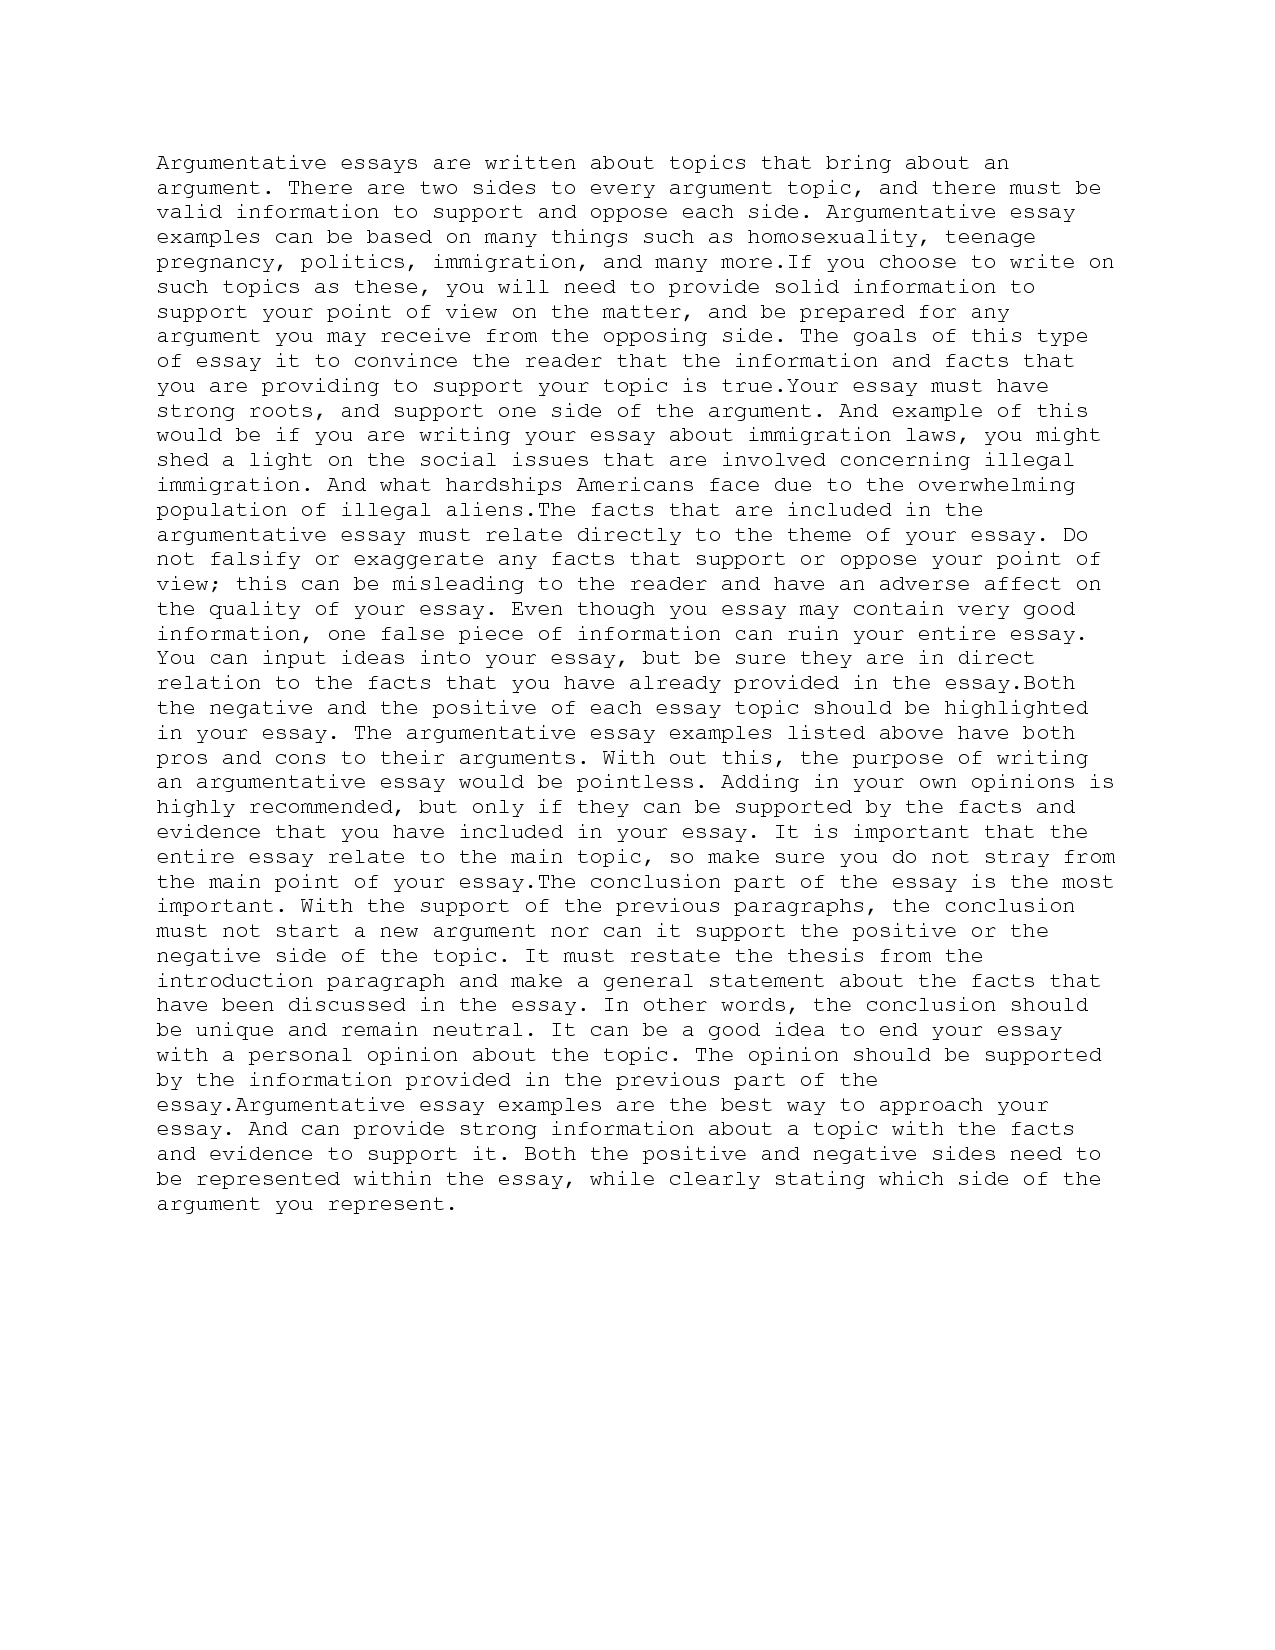 014 Qv3jjq5wkt Essay Example Good Topics For Wonderful A Discursive National 5 Interesting Persuasive Full